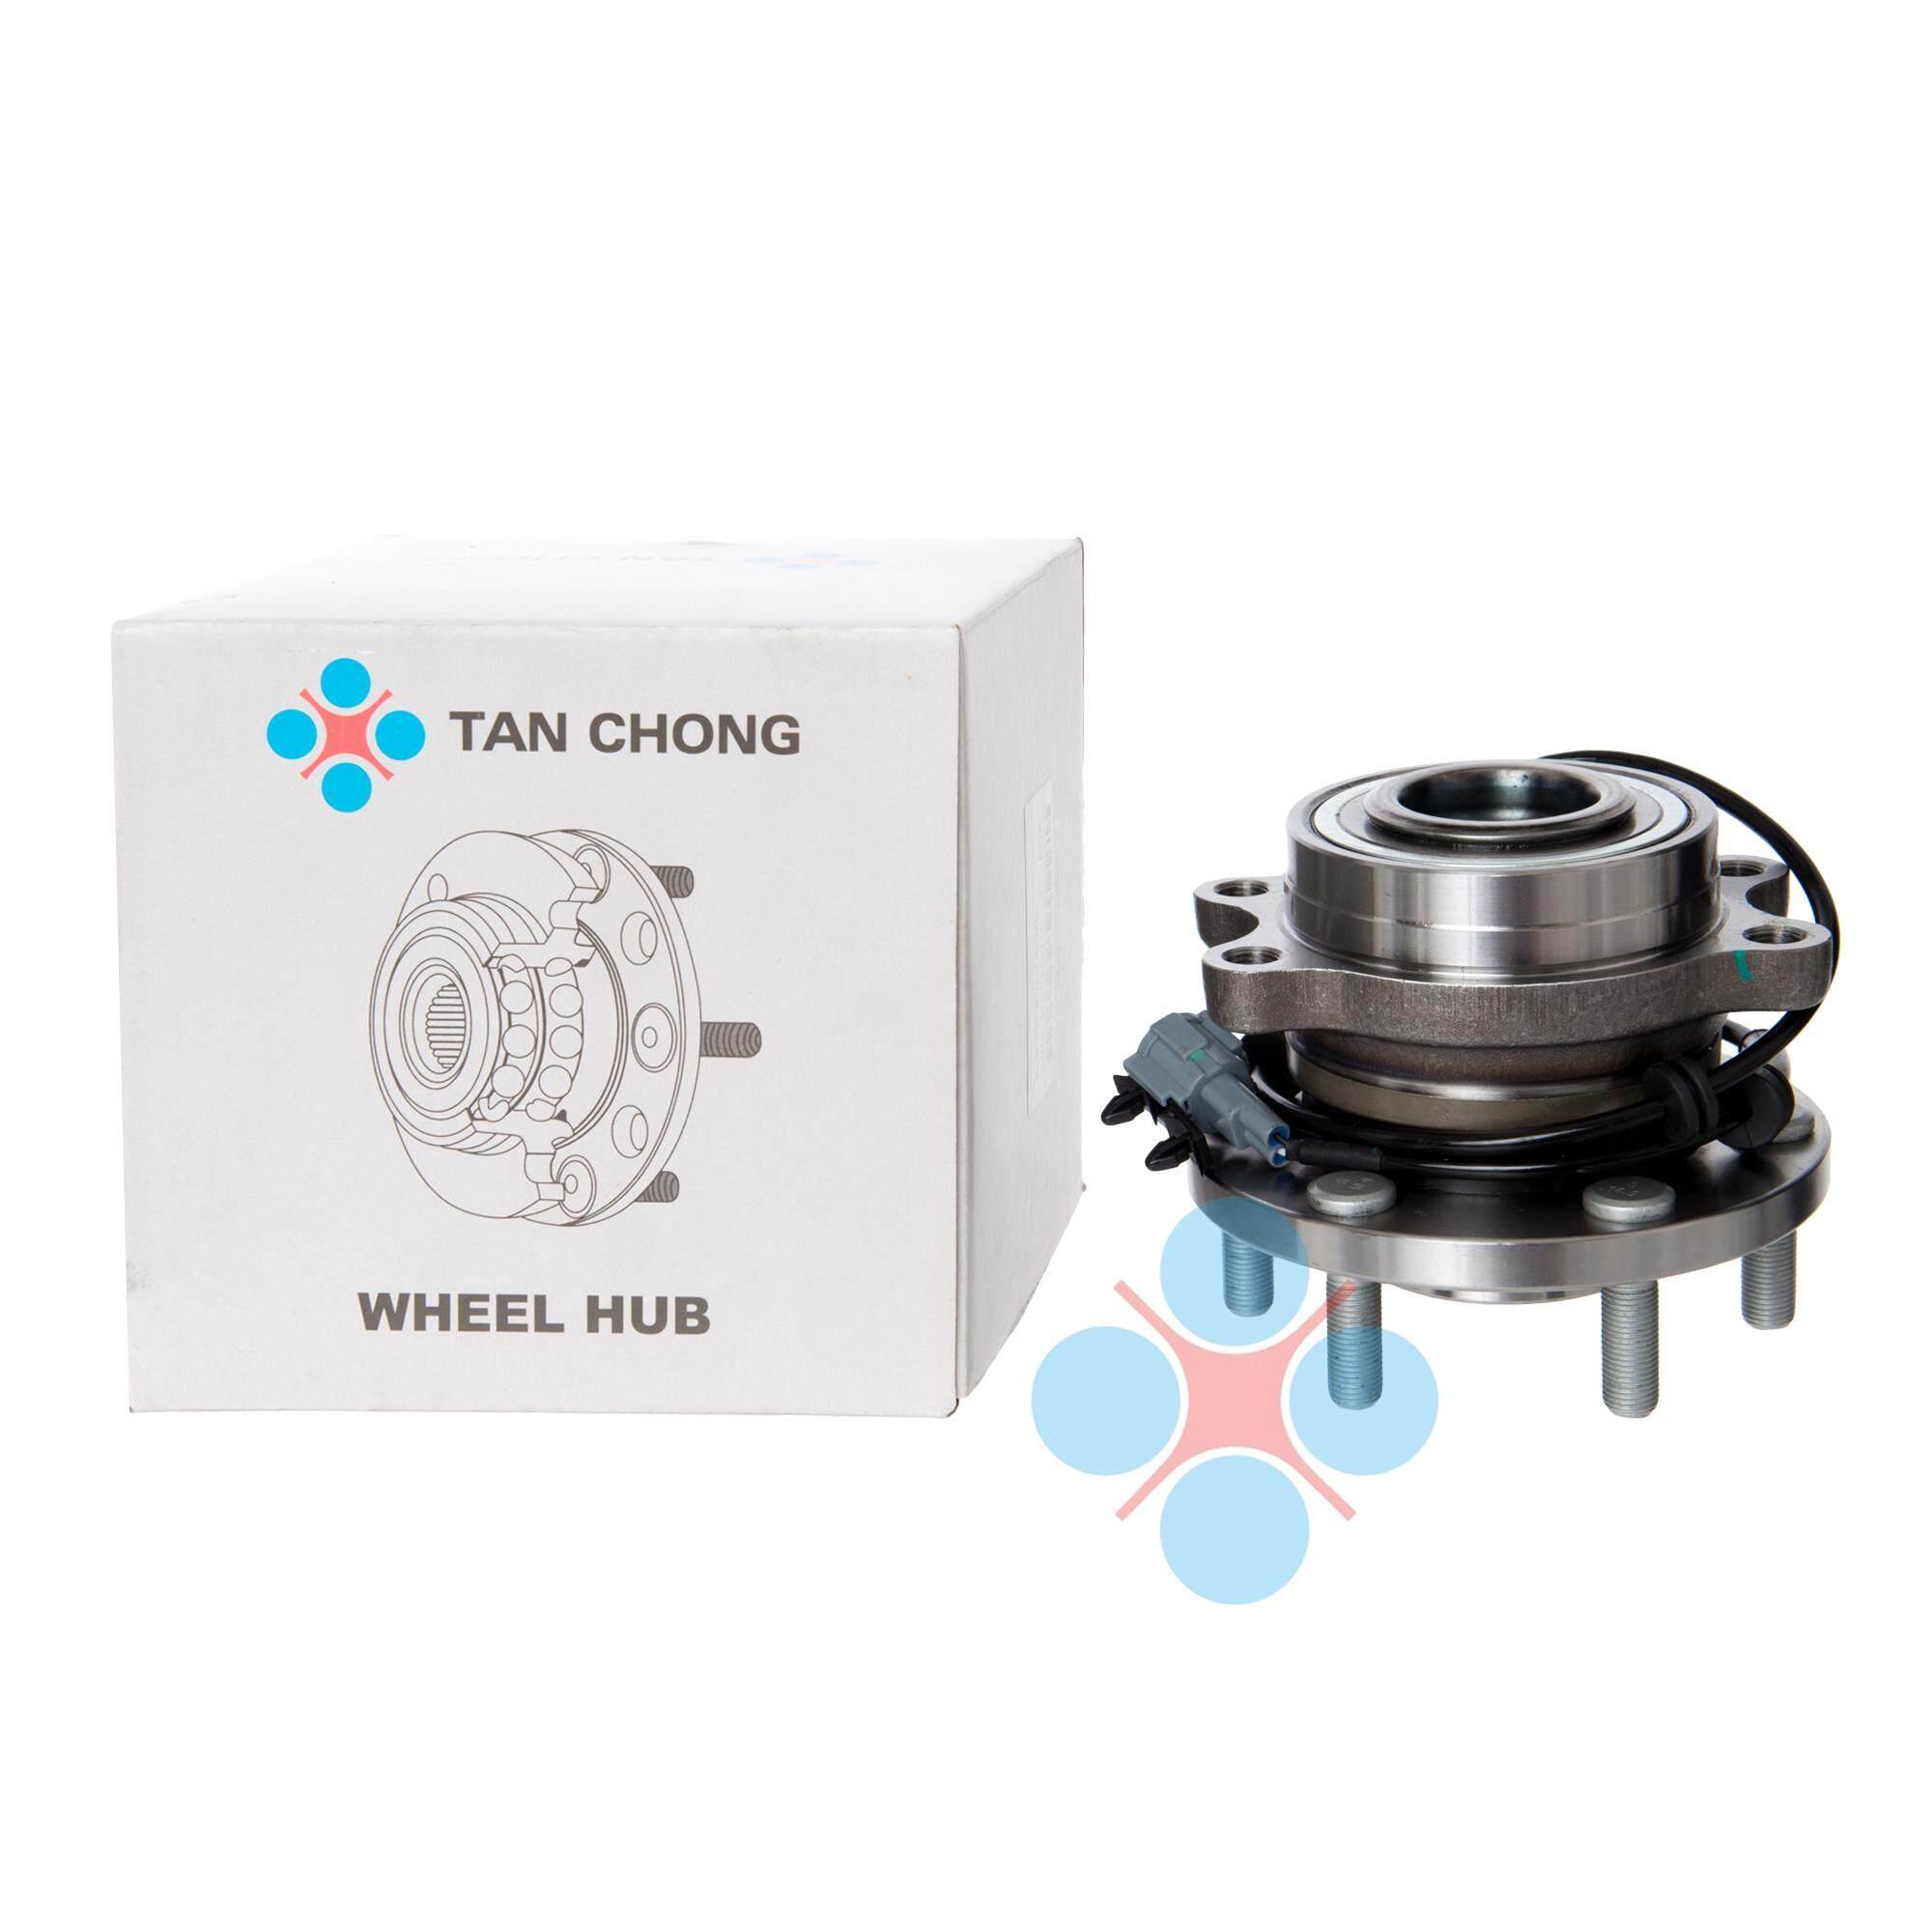 Features Tc Fuel Filter Nissan Navara D40 Dan Harga Terbaru Info Filters Front Wheel Hub Abs